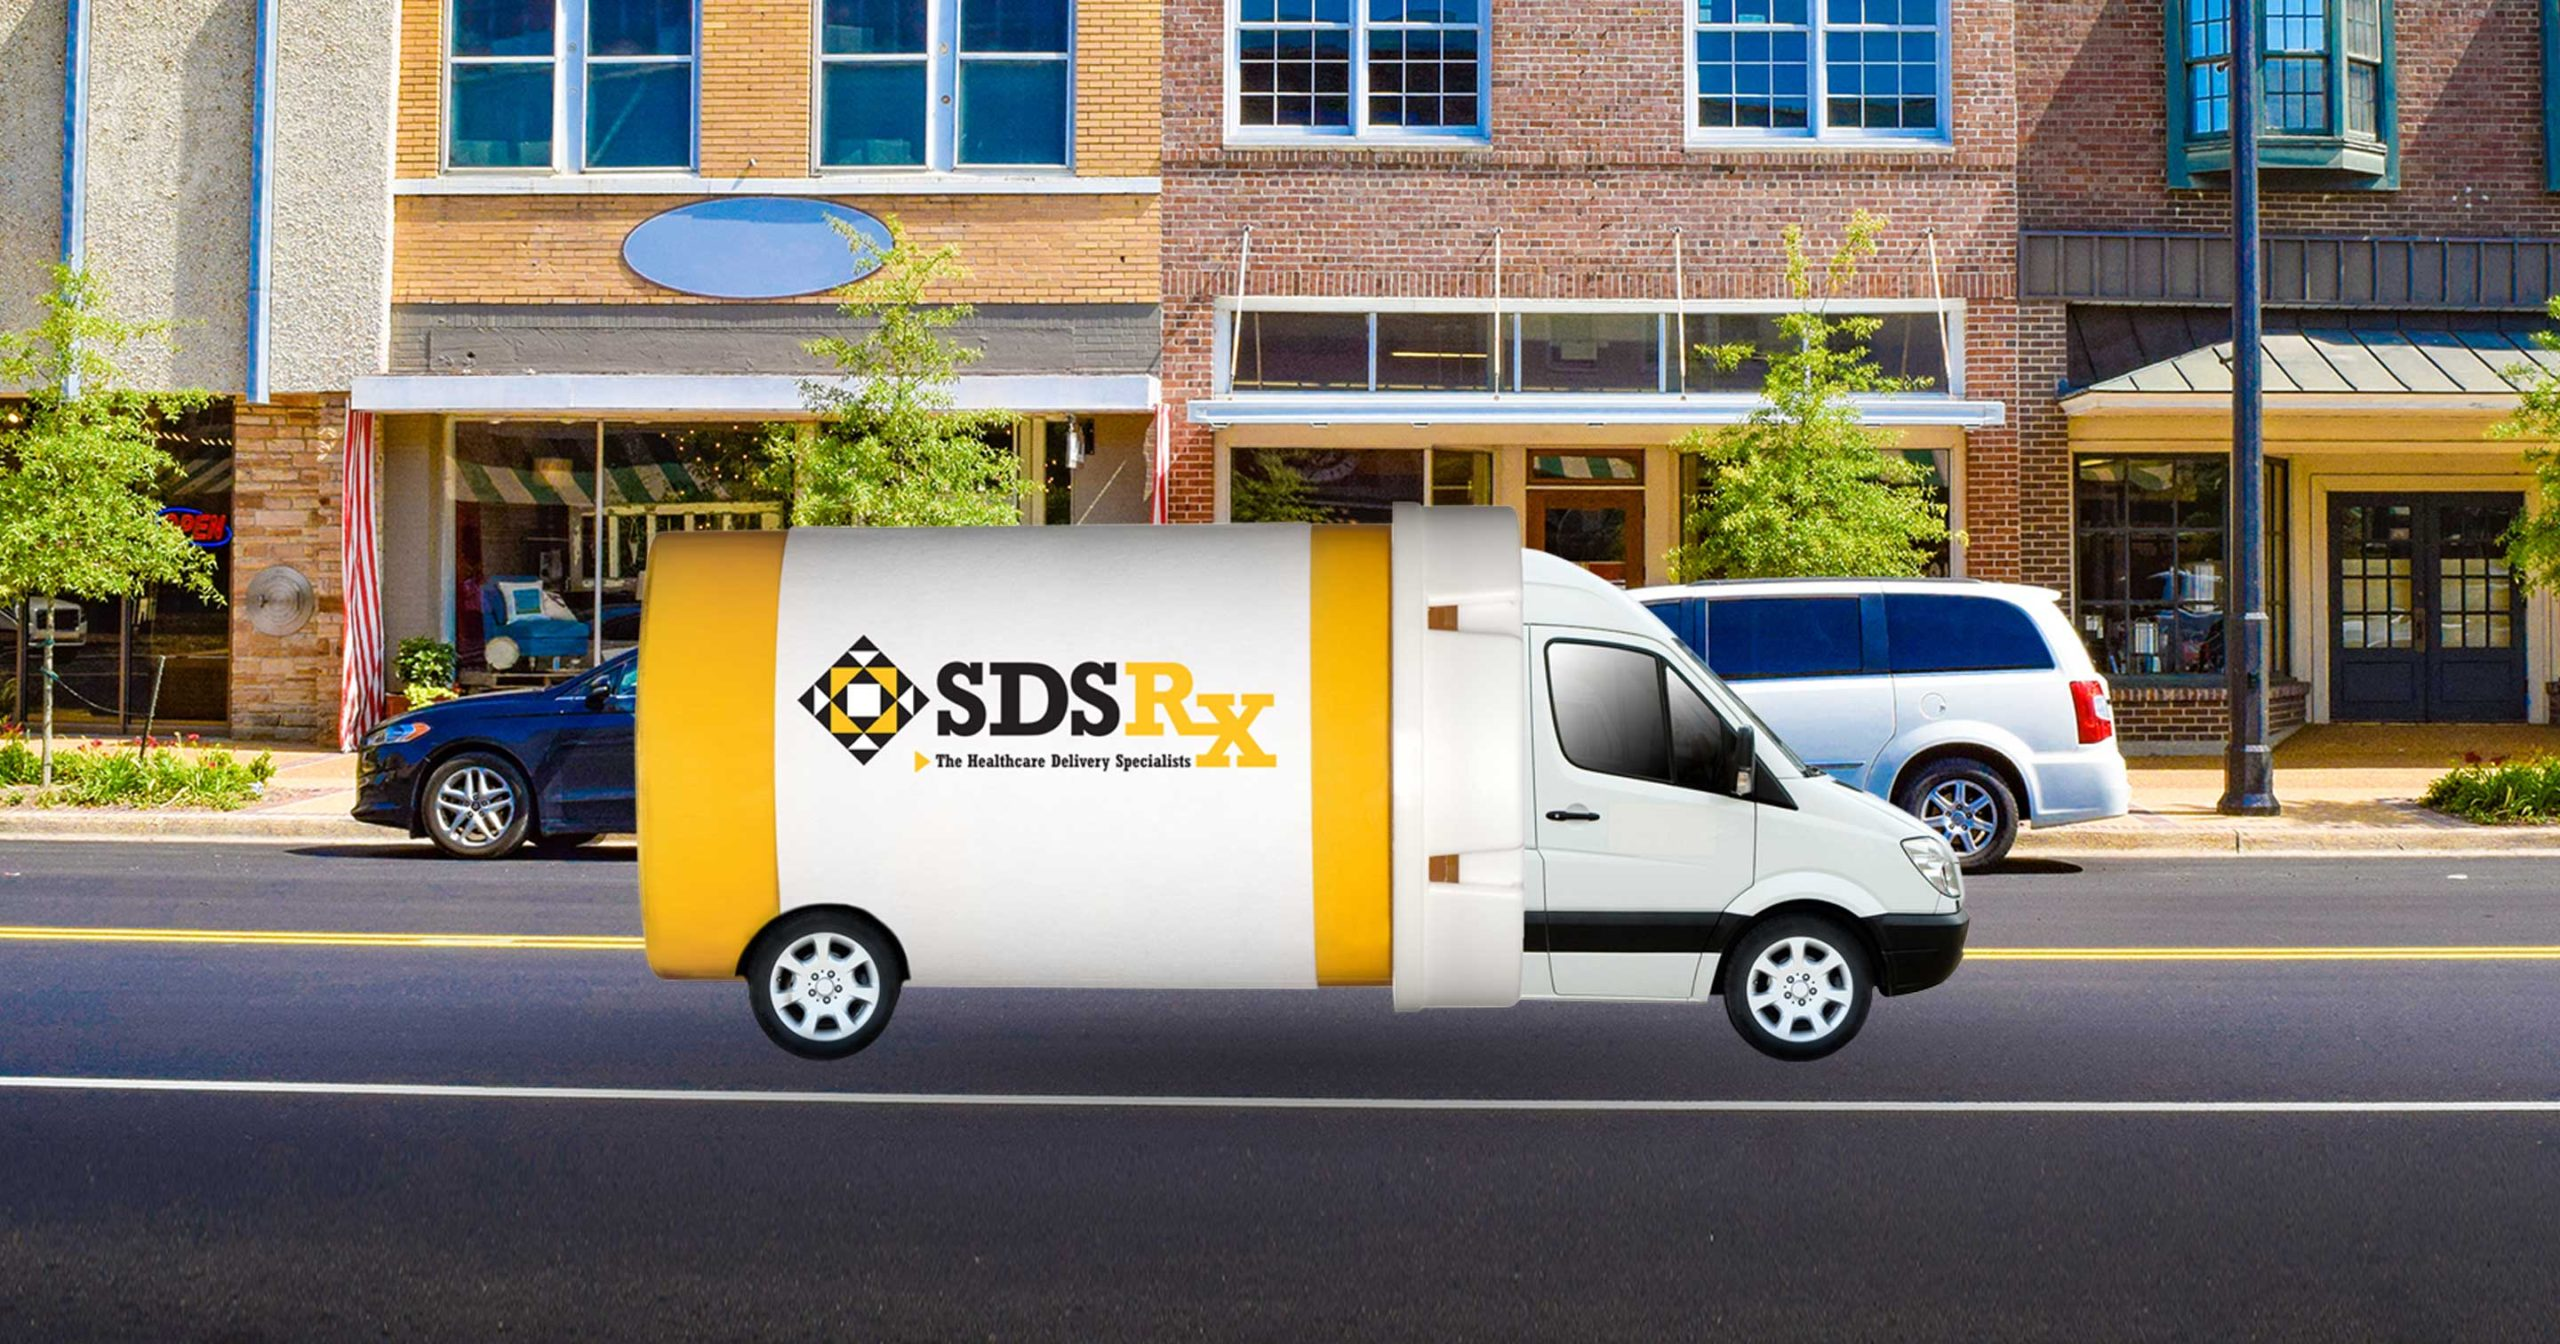 SDS Rx